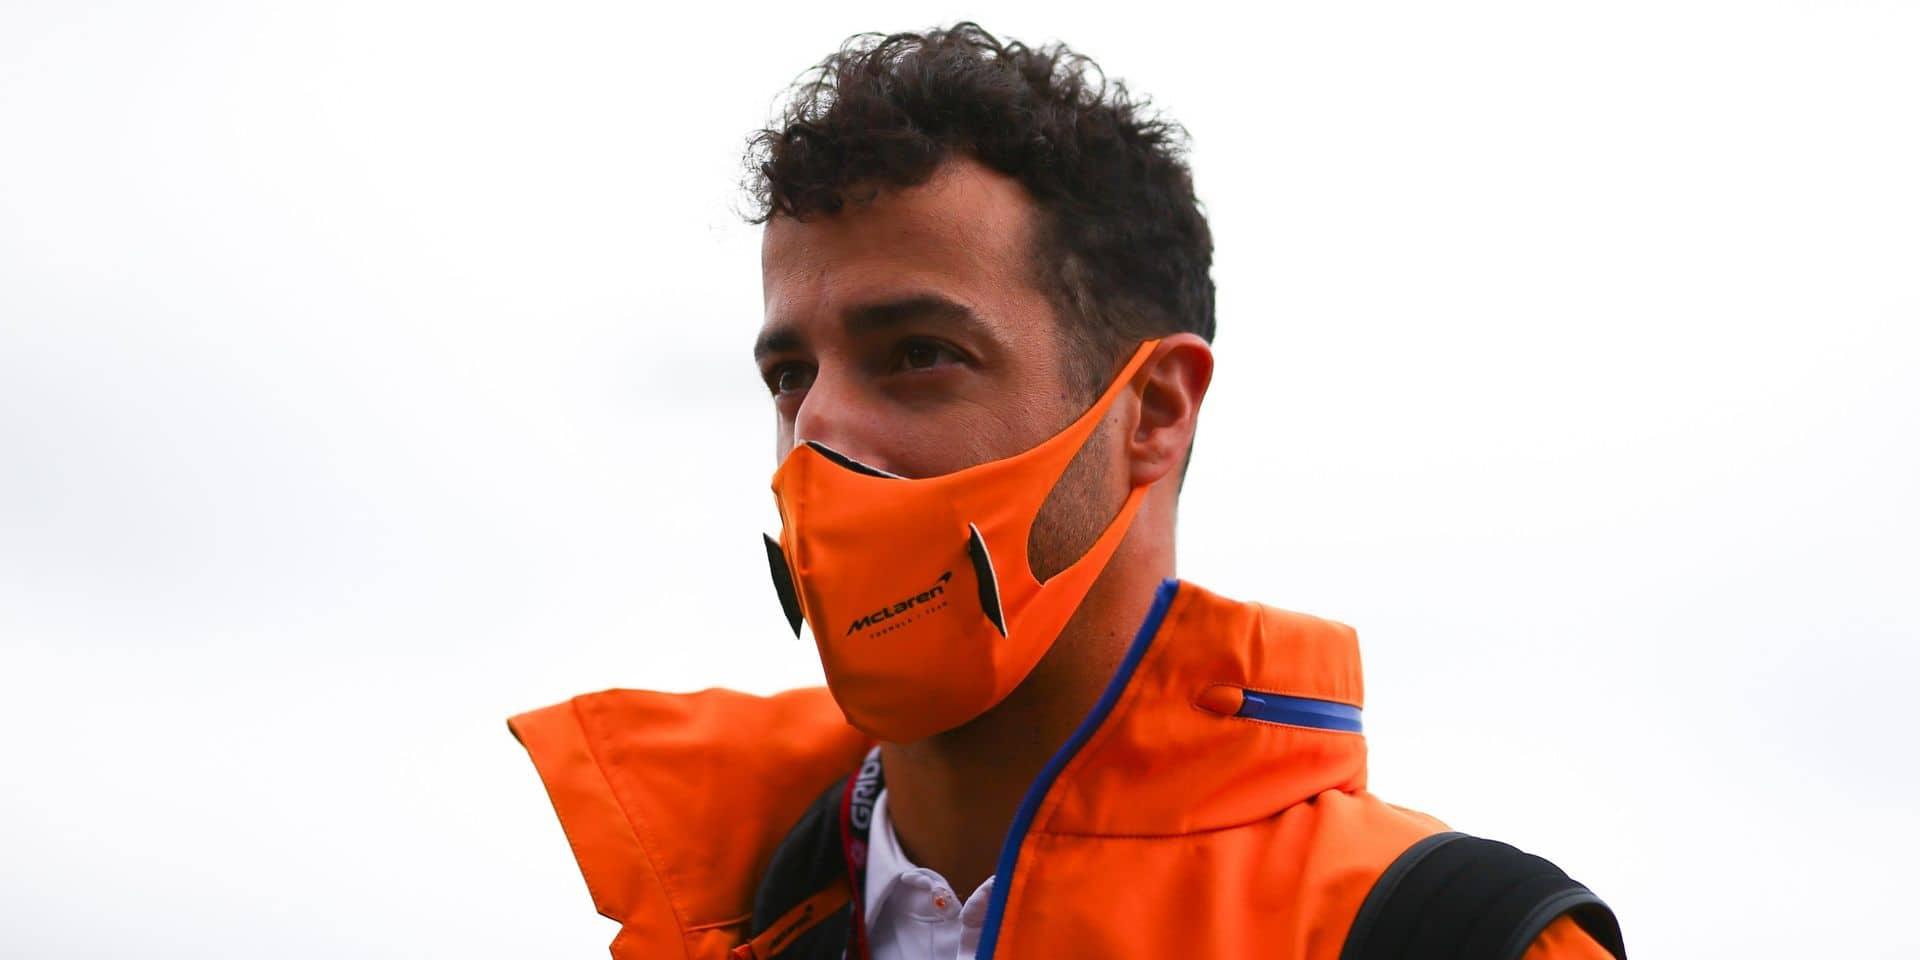 Daniel Ricciardo et Eli Roth, invités à prendre la parole lors du Tomorrowland virtuel